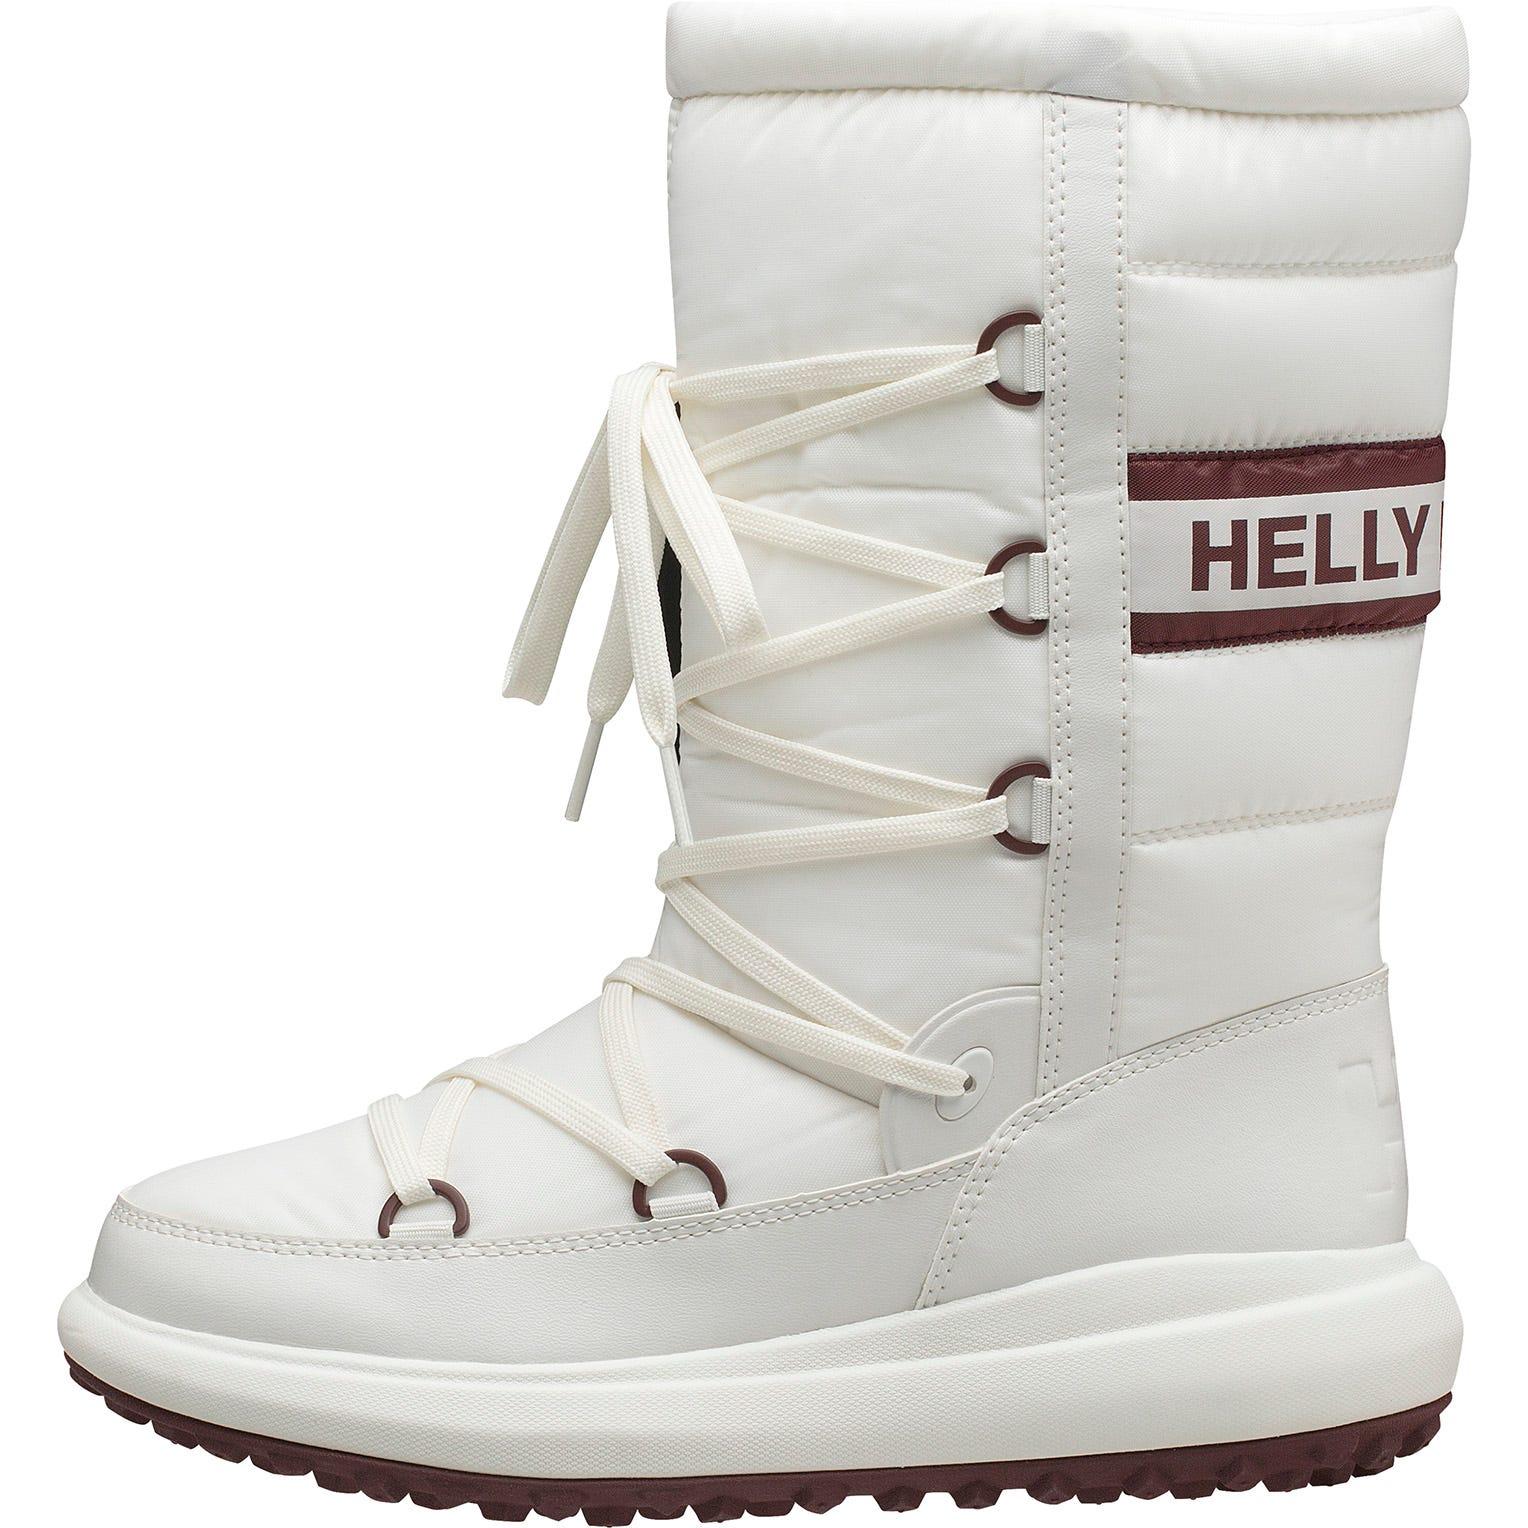 Helly Hansen W Isolabella Grand Womens Winter Boot White 38/7